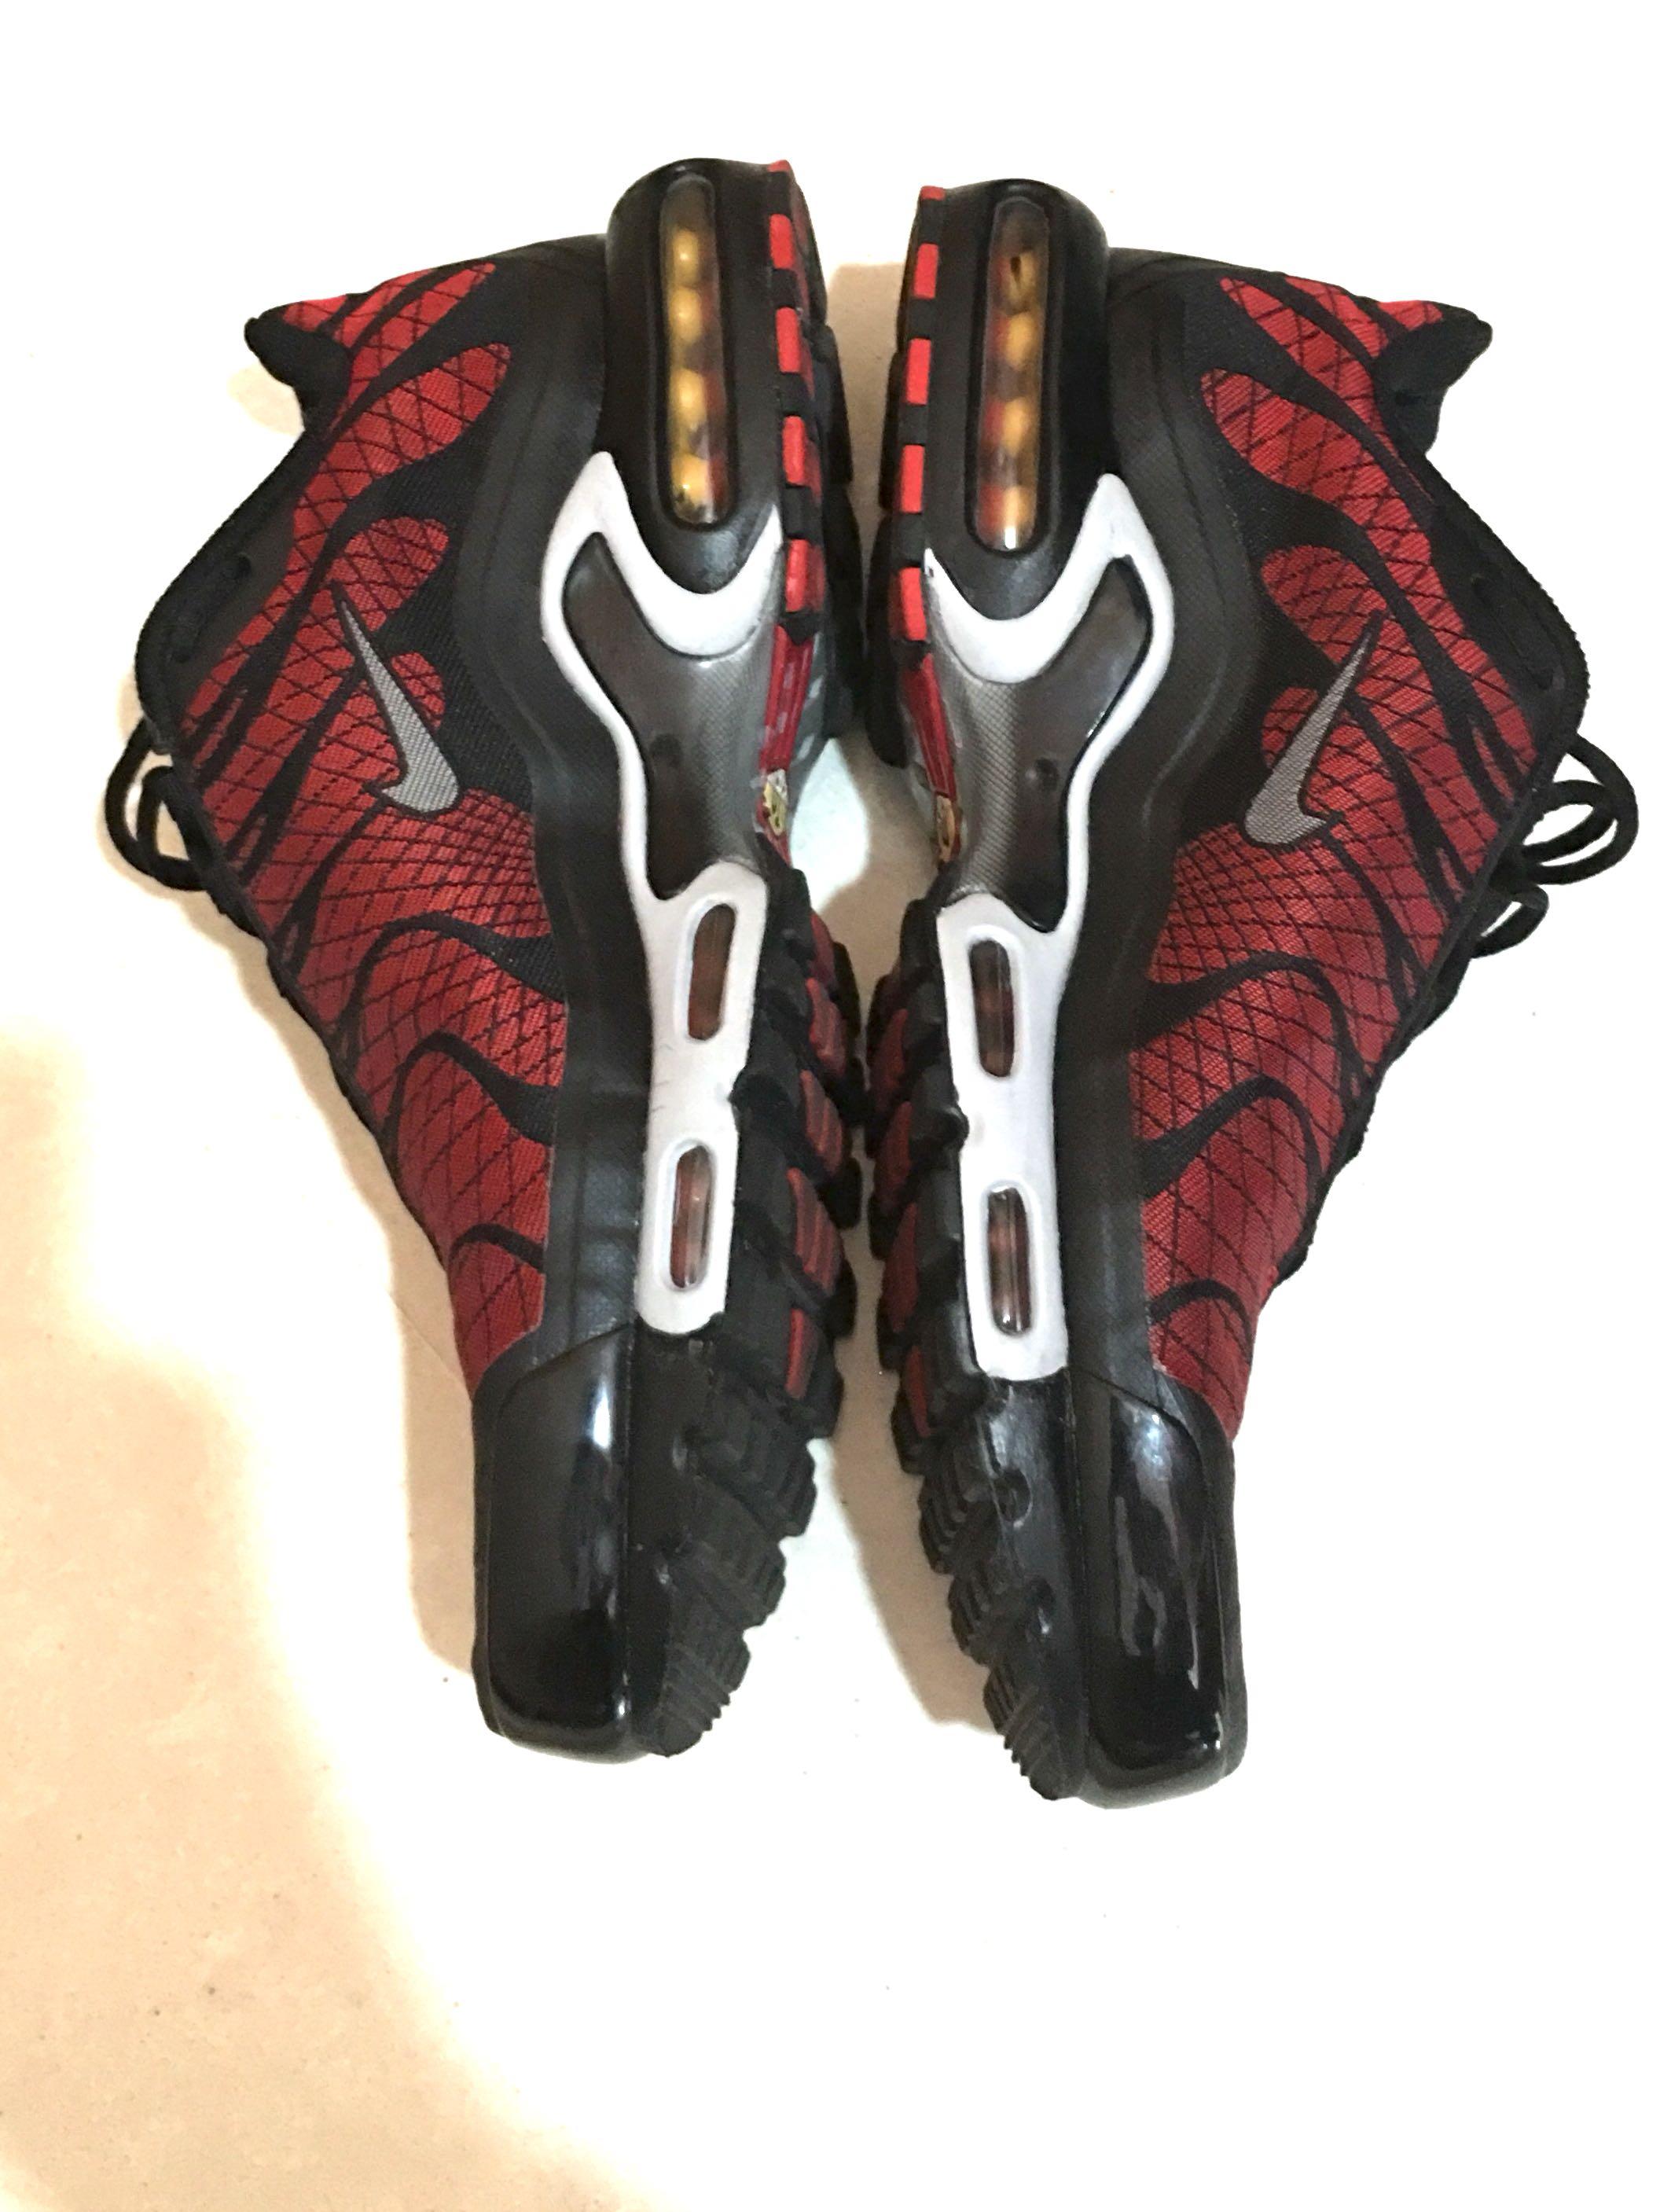 2bfaa750a0 Nike Air Max Plus TN Jacquard, Sports, Sports Apparel on Carousell